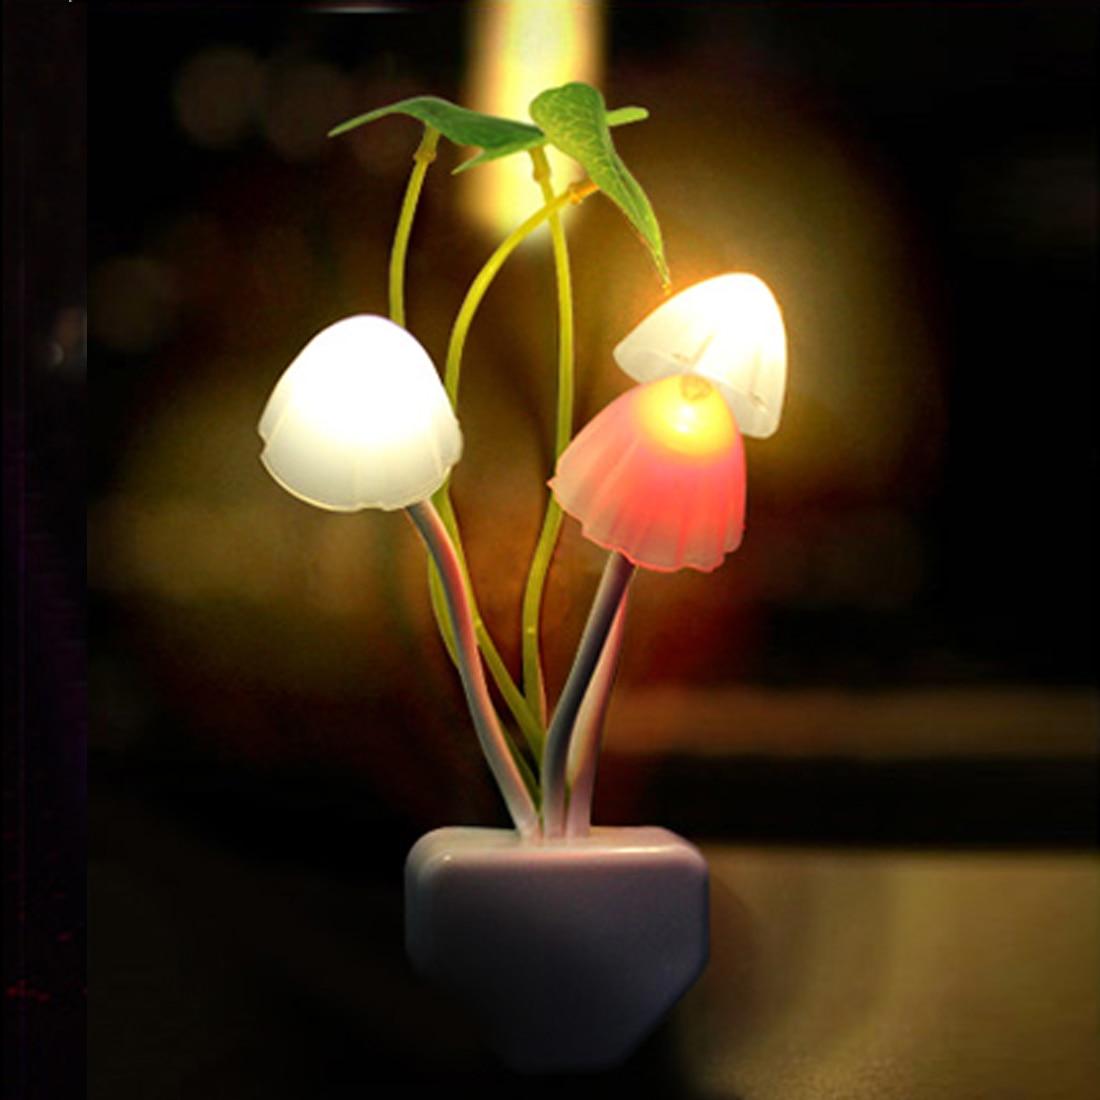 3 LED Colorful Mushroom Lamp 1pc  Novelty Mushroom Fungus Night Light Plug Light Sensor AC110V-220V Led Night Lights For Baby